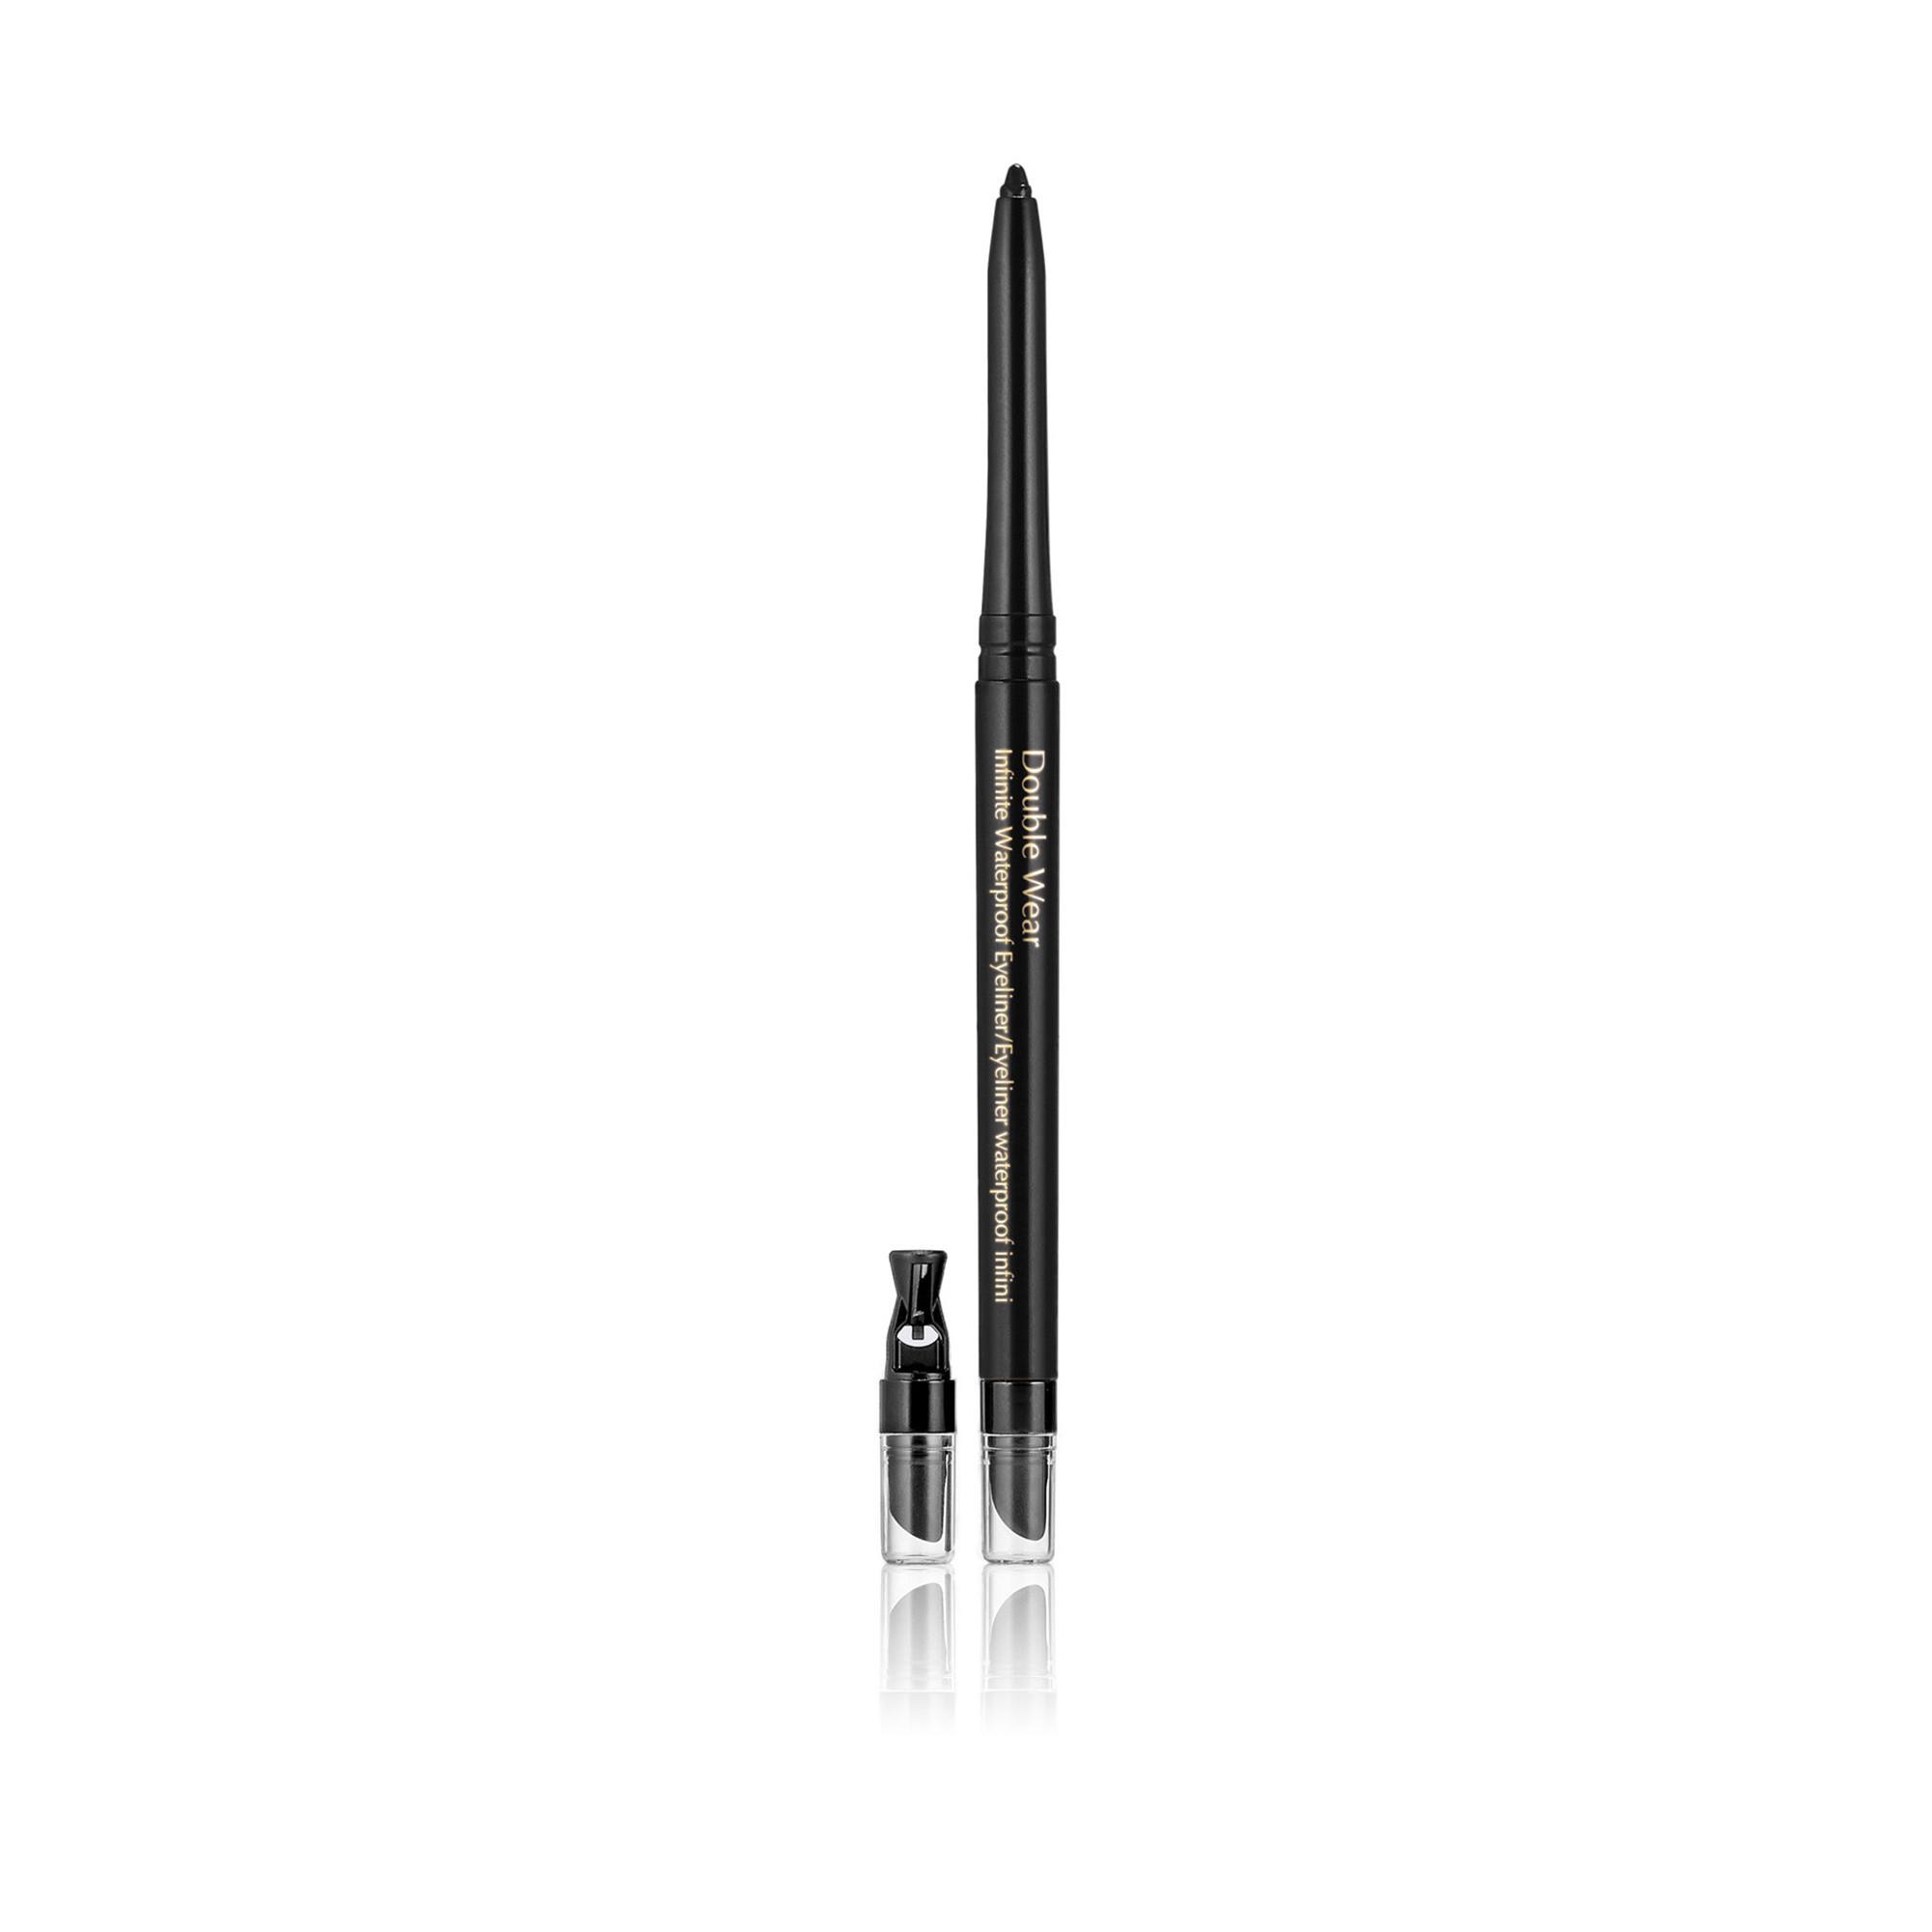 Estée Lauder double wear infinite waterproof eyeliner - kohl noir 35 g, KOHL NOIR, large image number 0